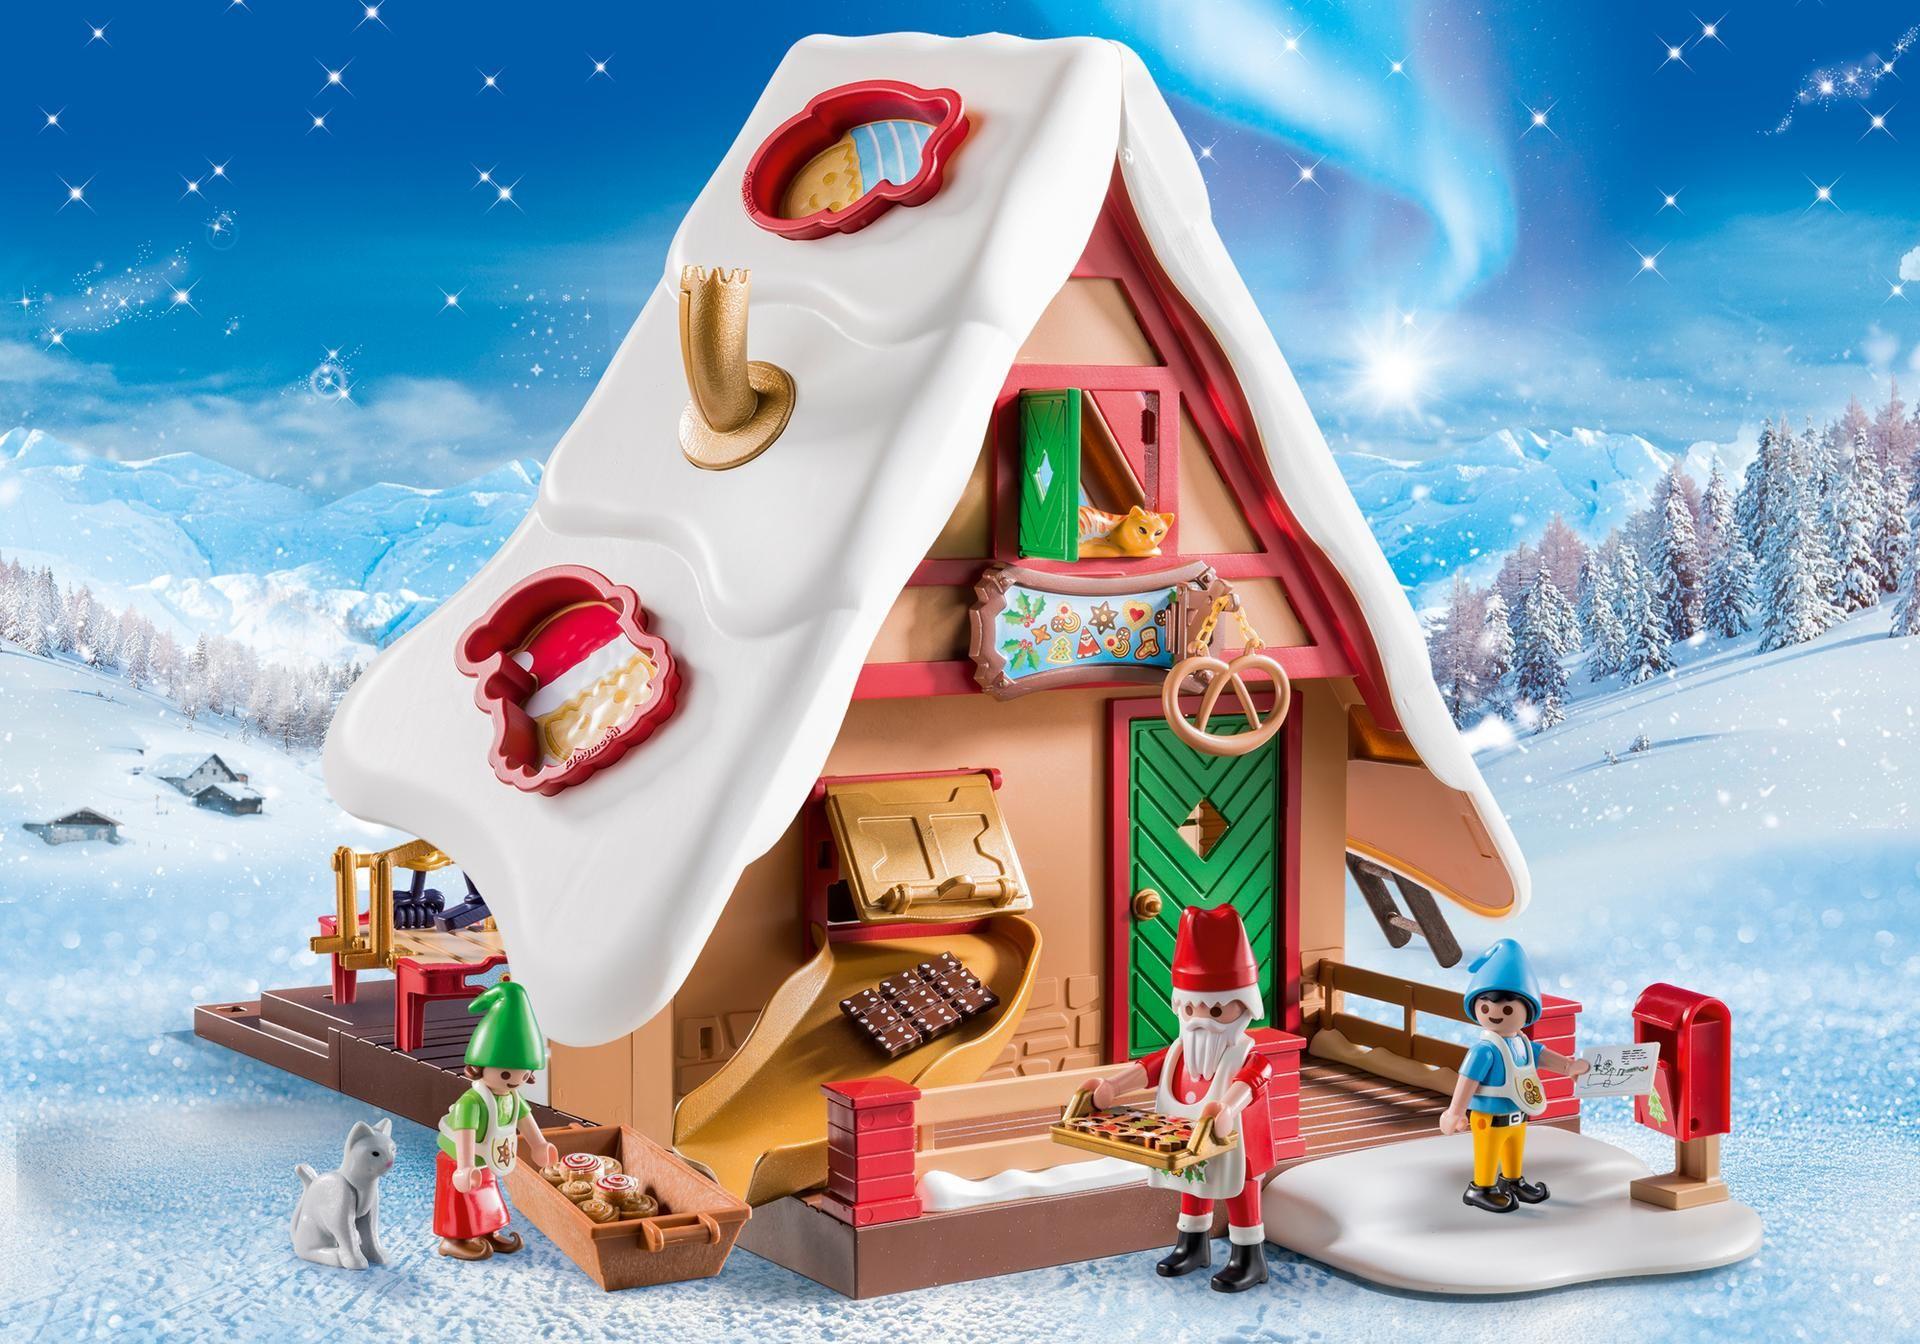 Http Media Playmobil Com I Playmobil 9493 Product Detail Christmas Toys Playmobil Cool Toys